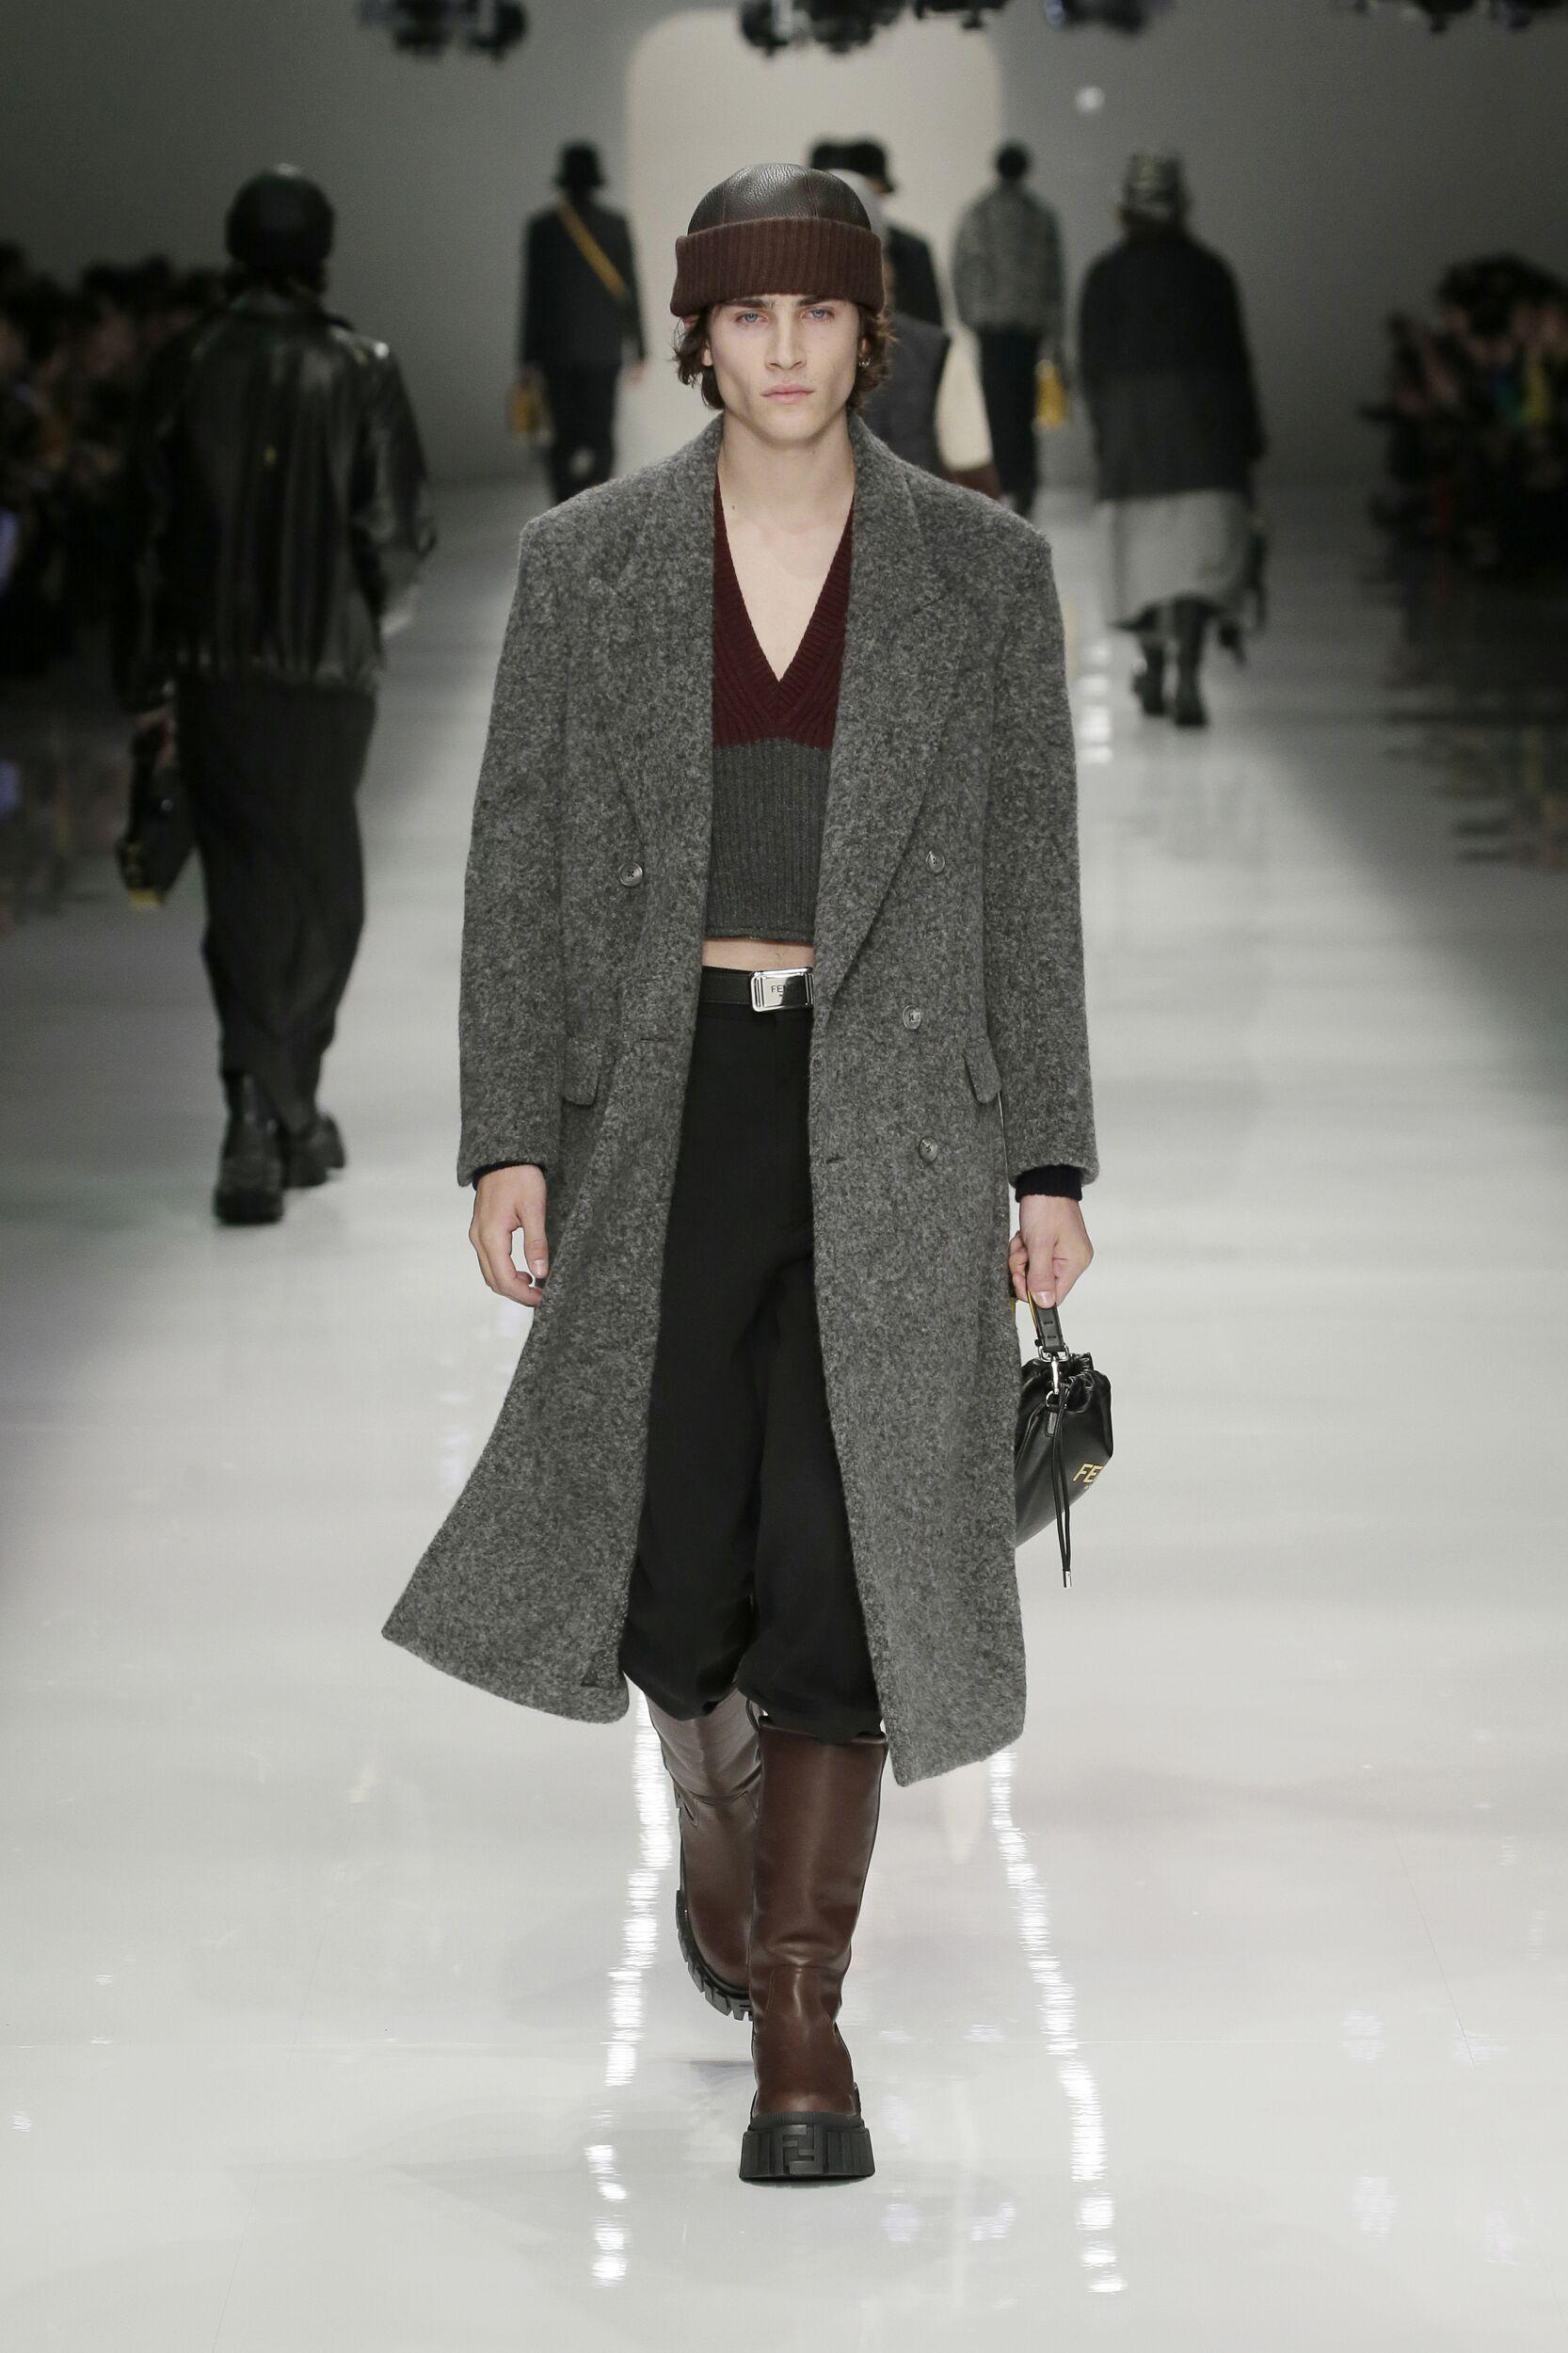 Fendi FW 2020 Menswear